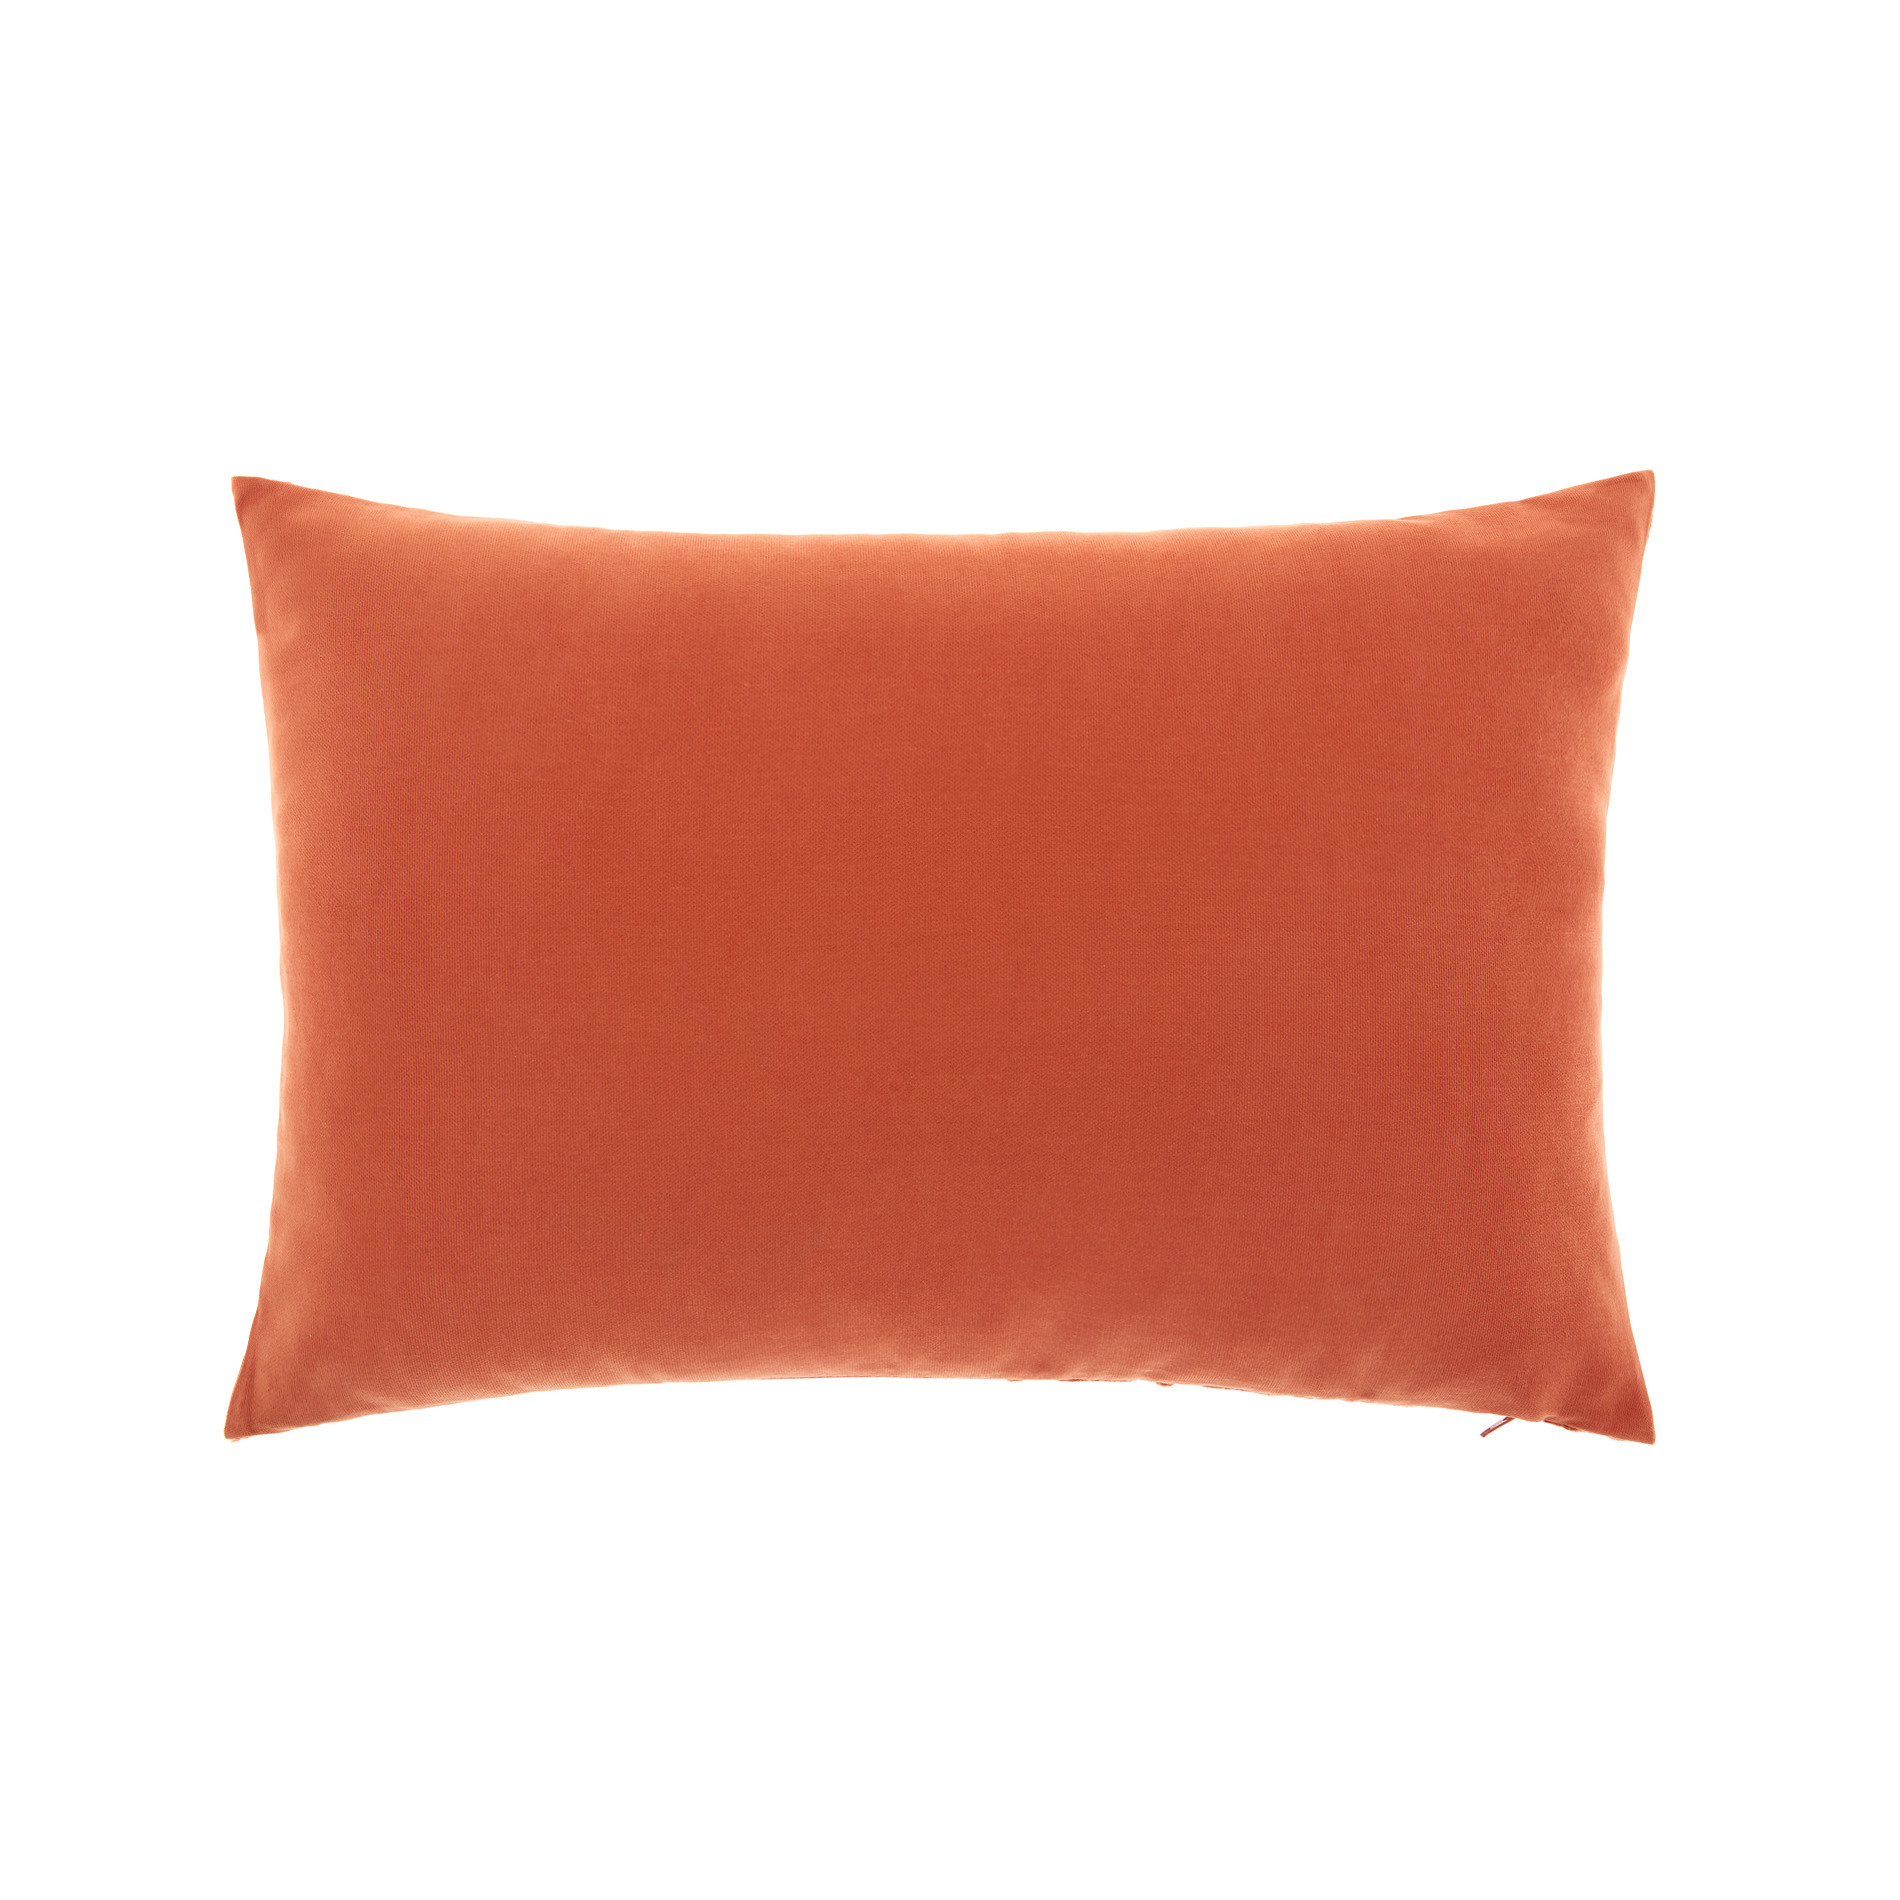 Cuscino velluto motivo geometrico 35x55cm, Marrone chiaro, large image number 1